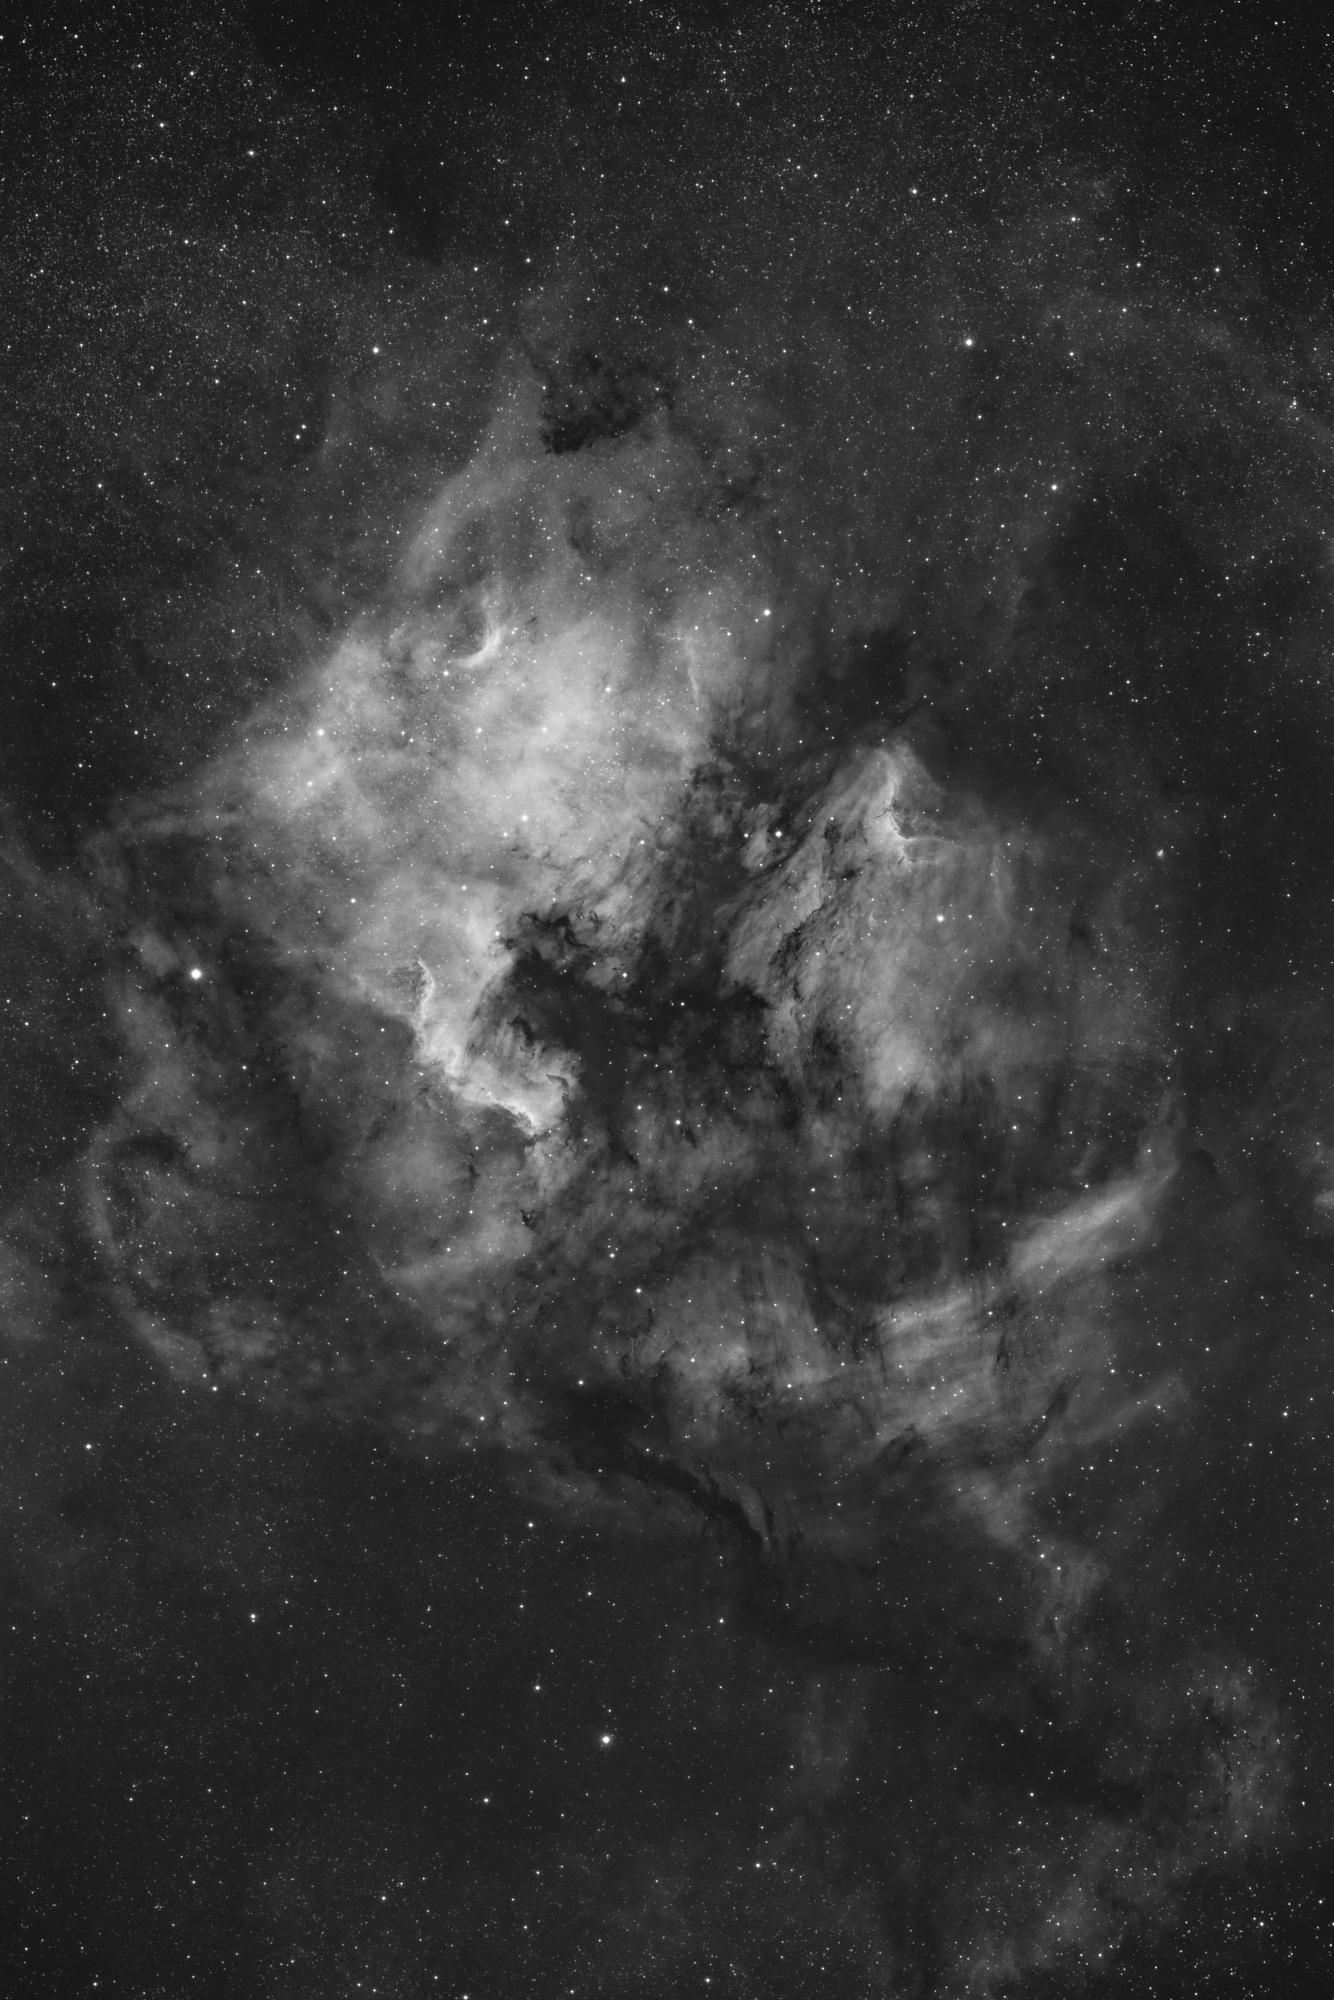 NGC7000_Ha-.thumb.jpg.c1dff1e76f741c944d4d4023fd6de19a.jpg